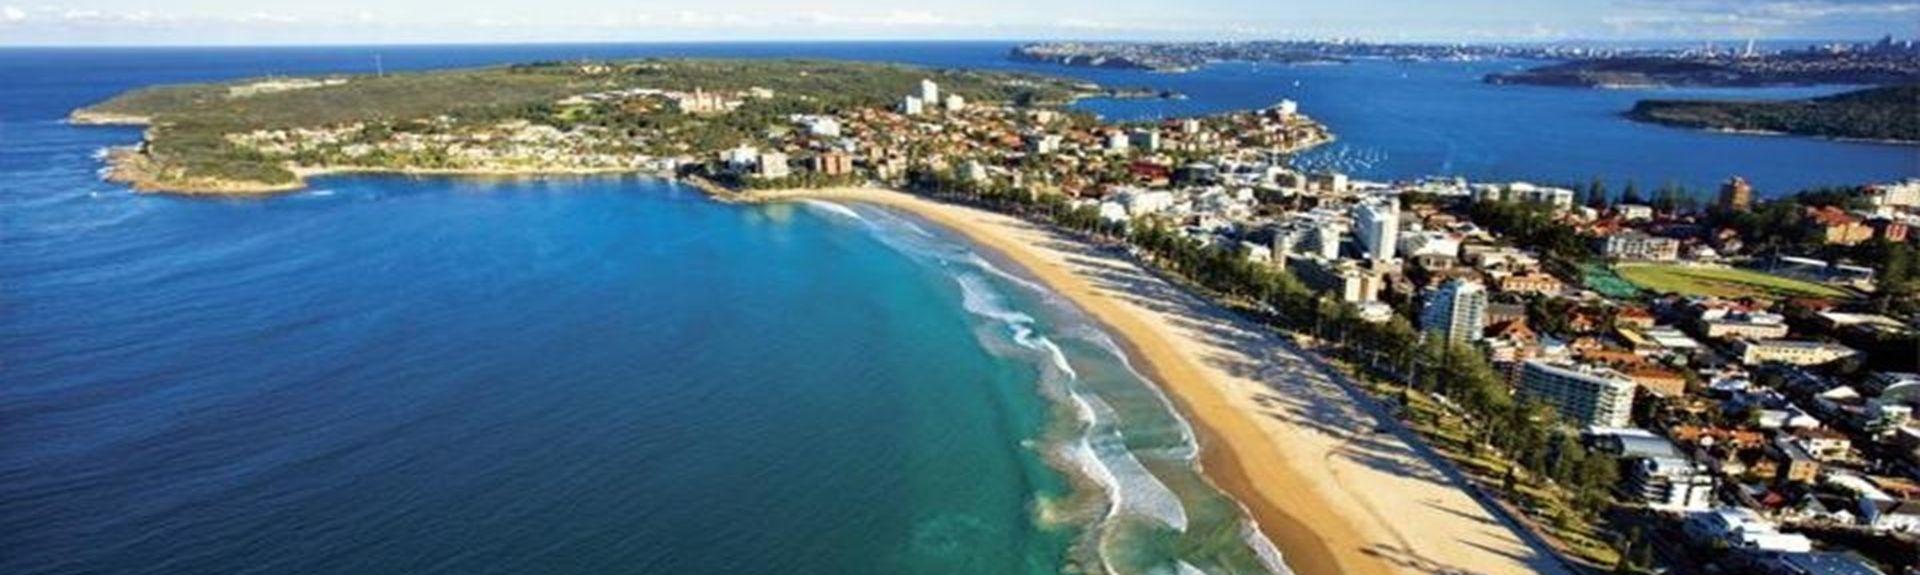 Redfern, Sydney, New South Wales, Australia